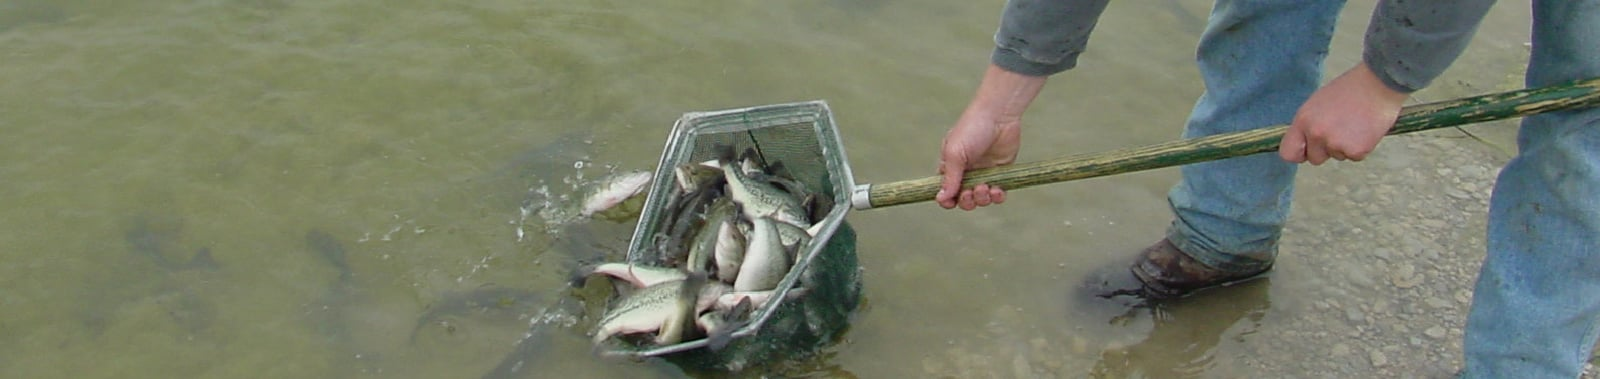 Fish Stocking and Fisheries Management | Magnolia Fisheries